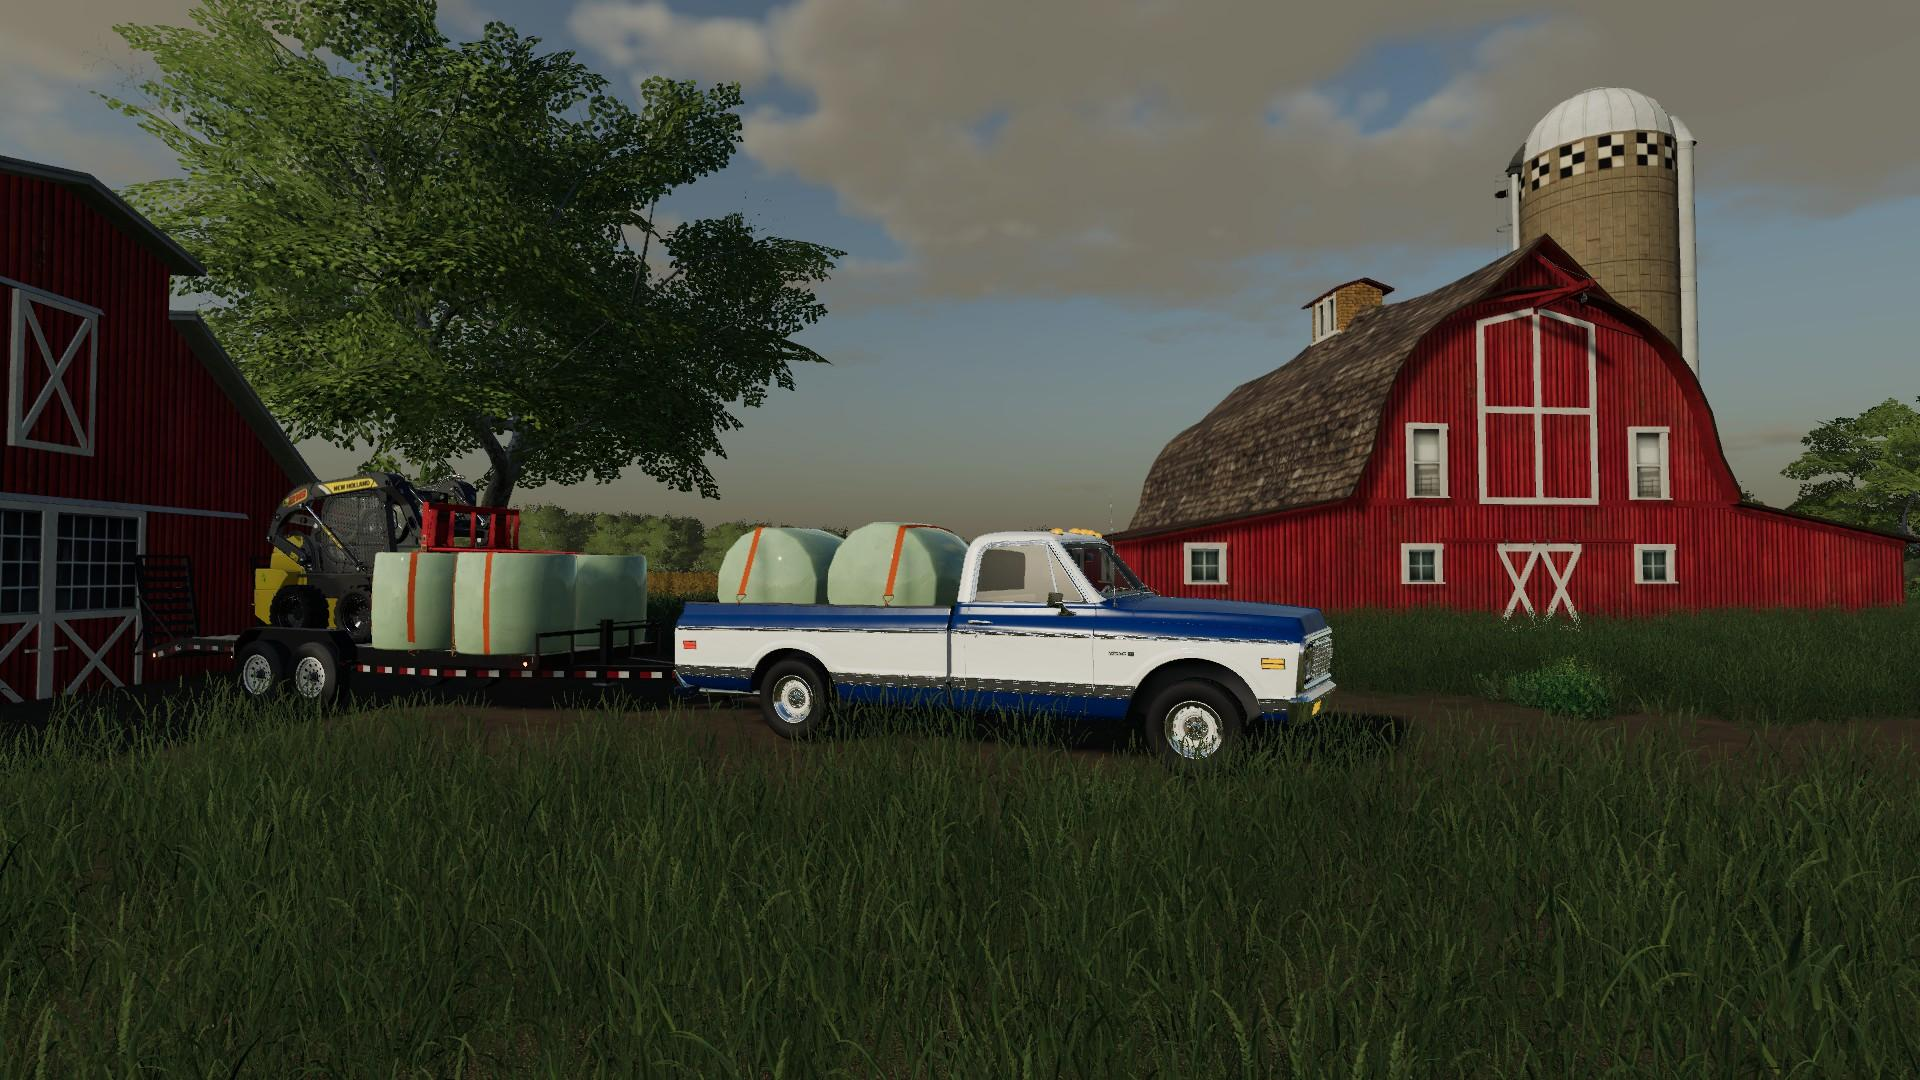 71 Chevy Long Bed v1.0 FS19 - Farming Simulator 19 Mod ...